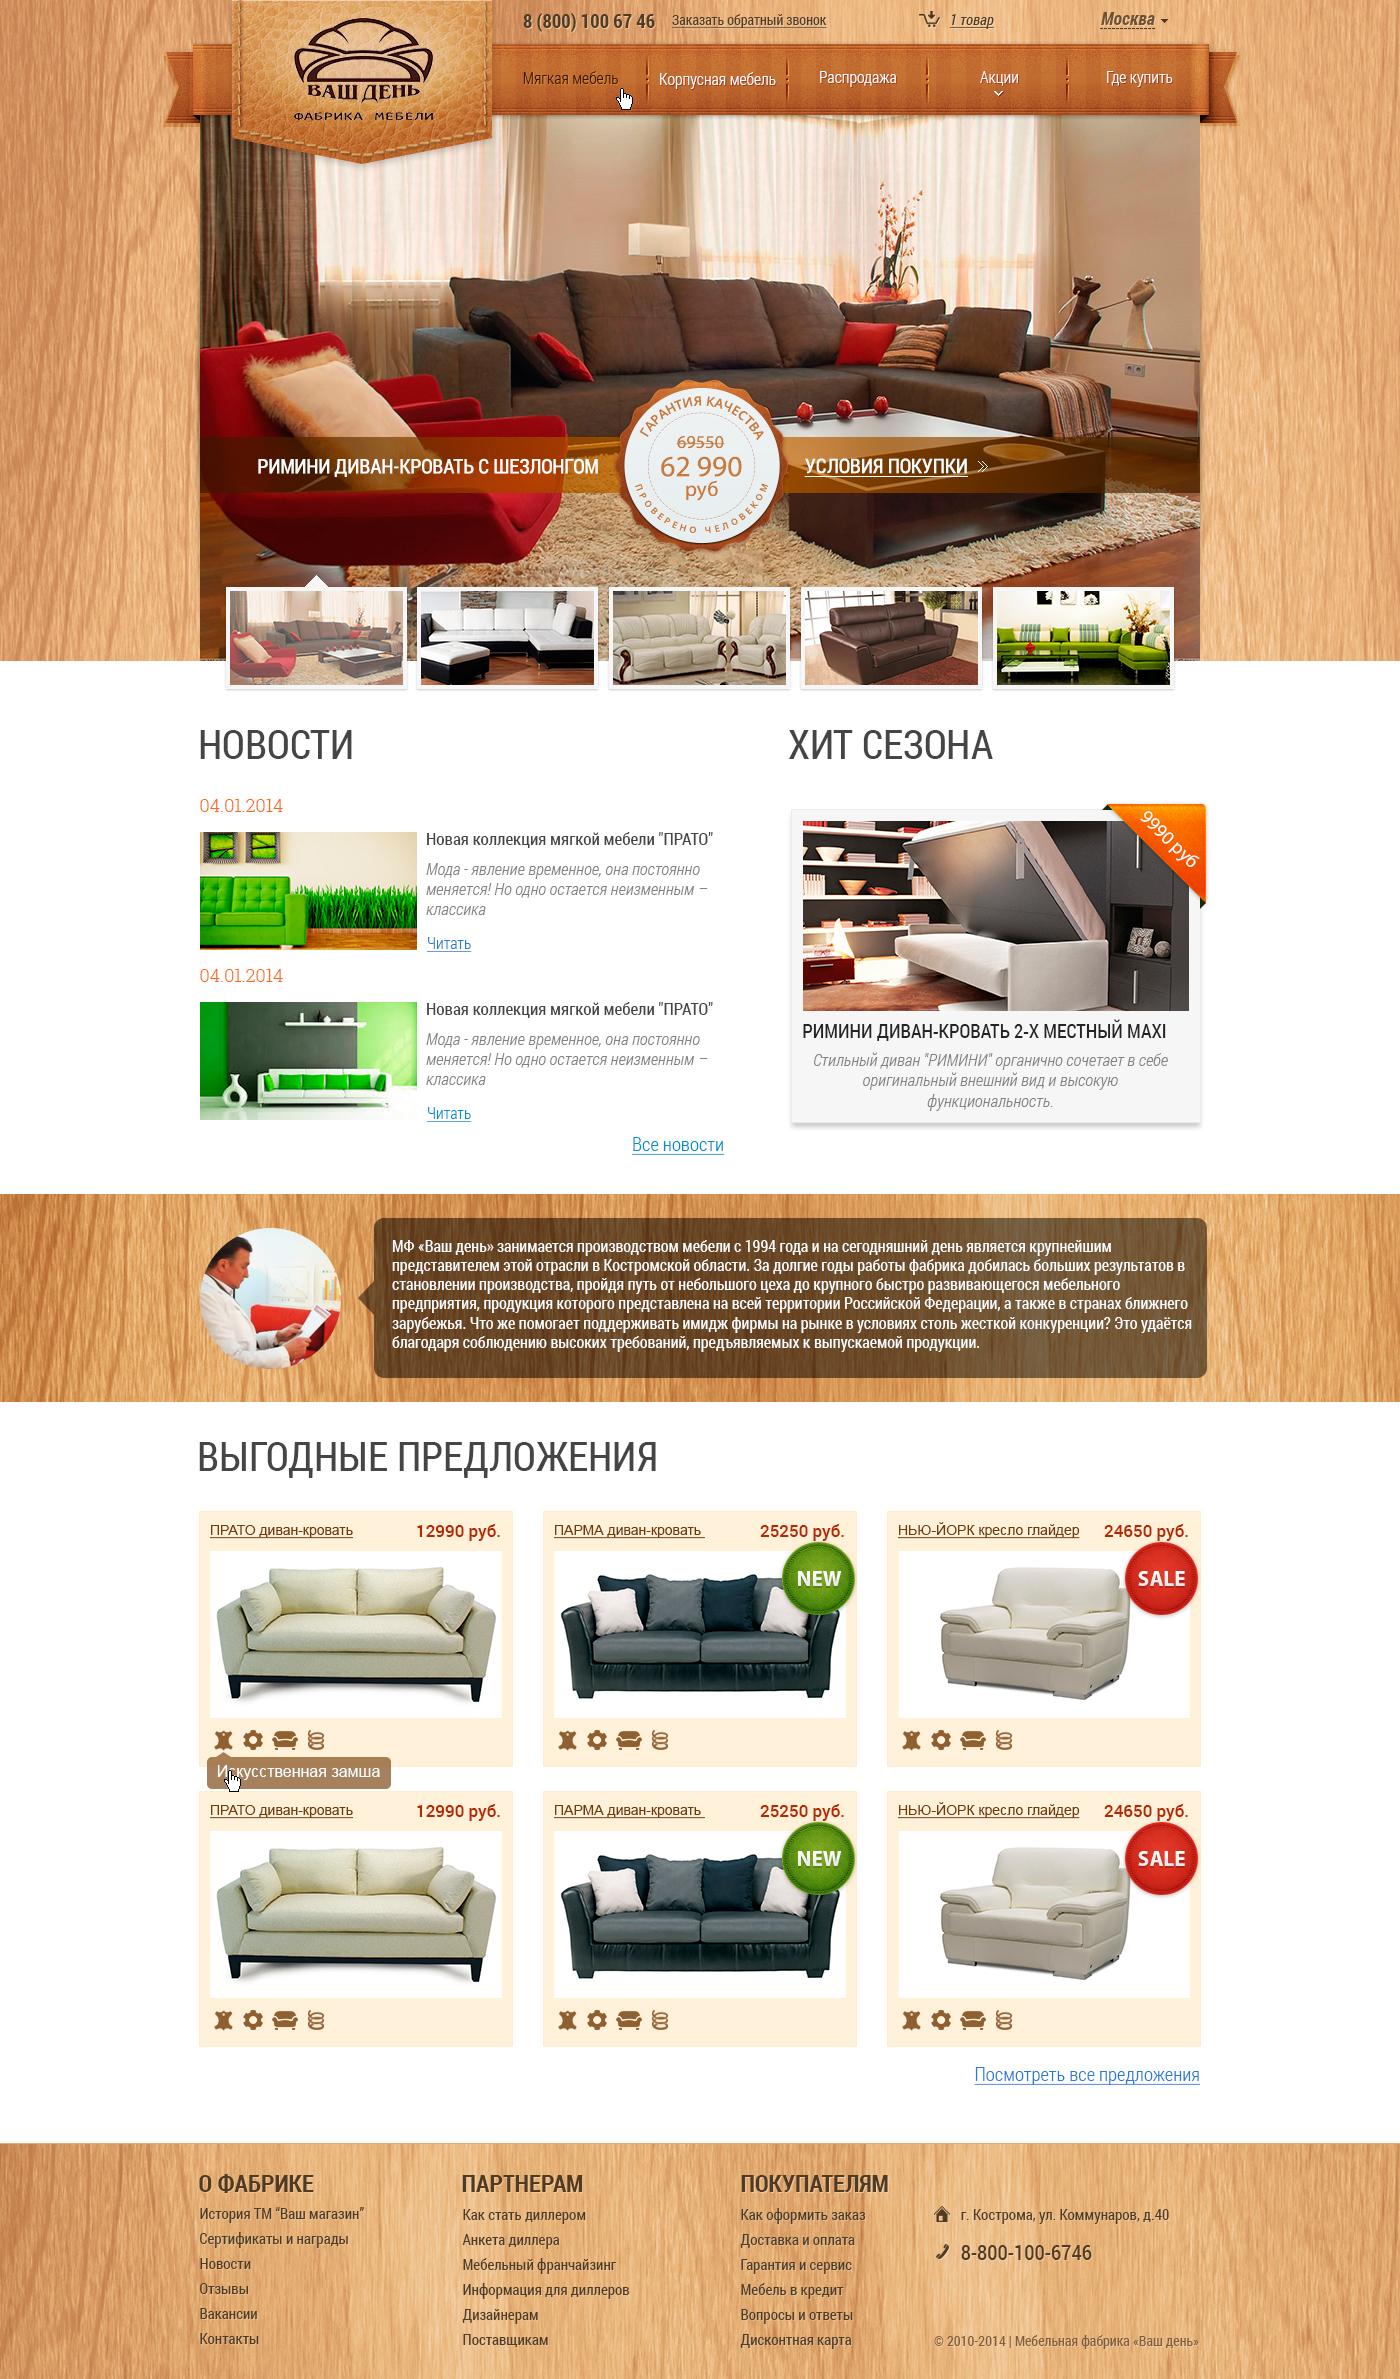 Разработать дизайн для интернет-магазина мебели фото f_37752e9da18c71f3.jpg